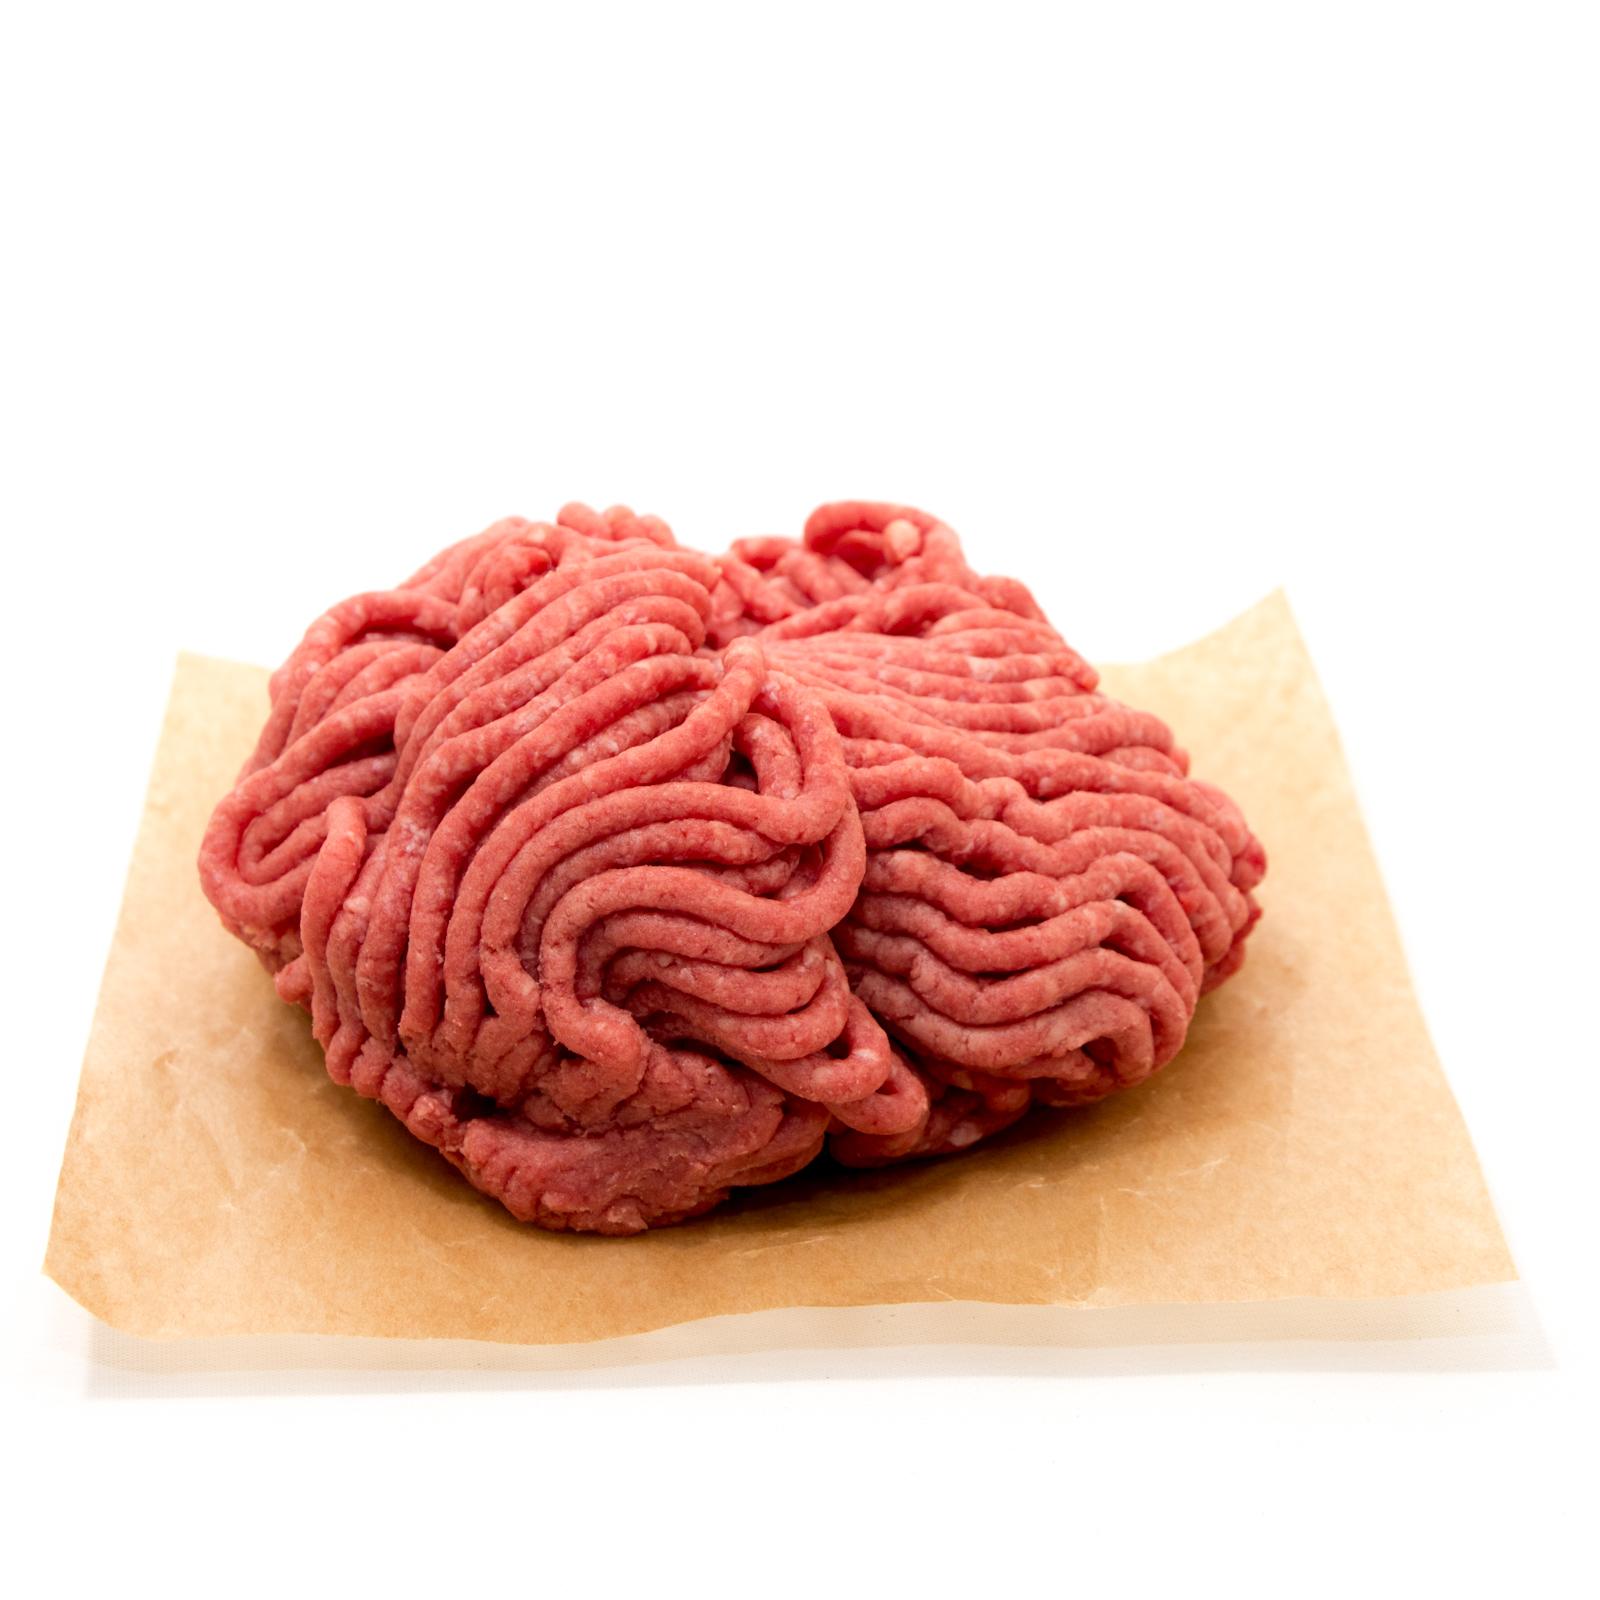 grassfed wagyu lean. Beef clipart ground beef